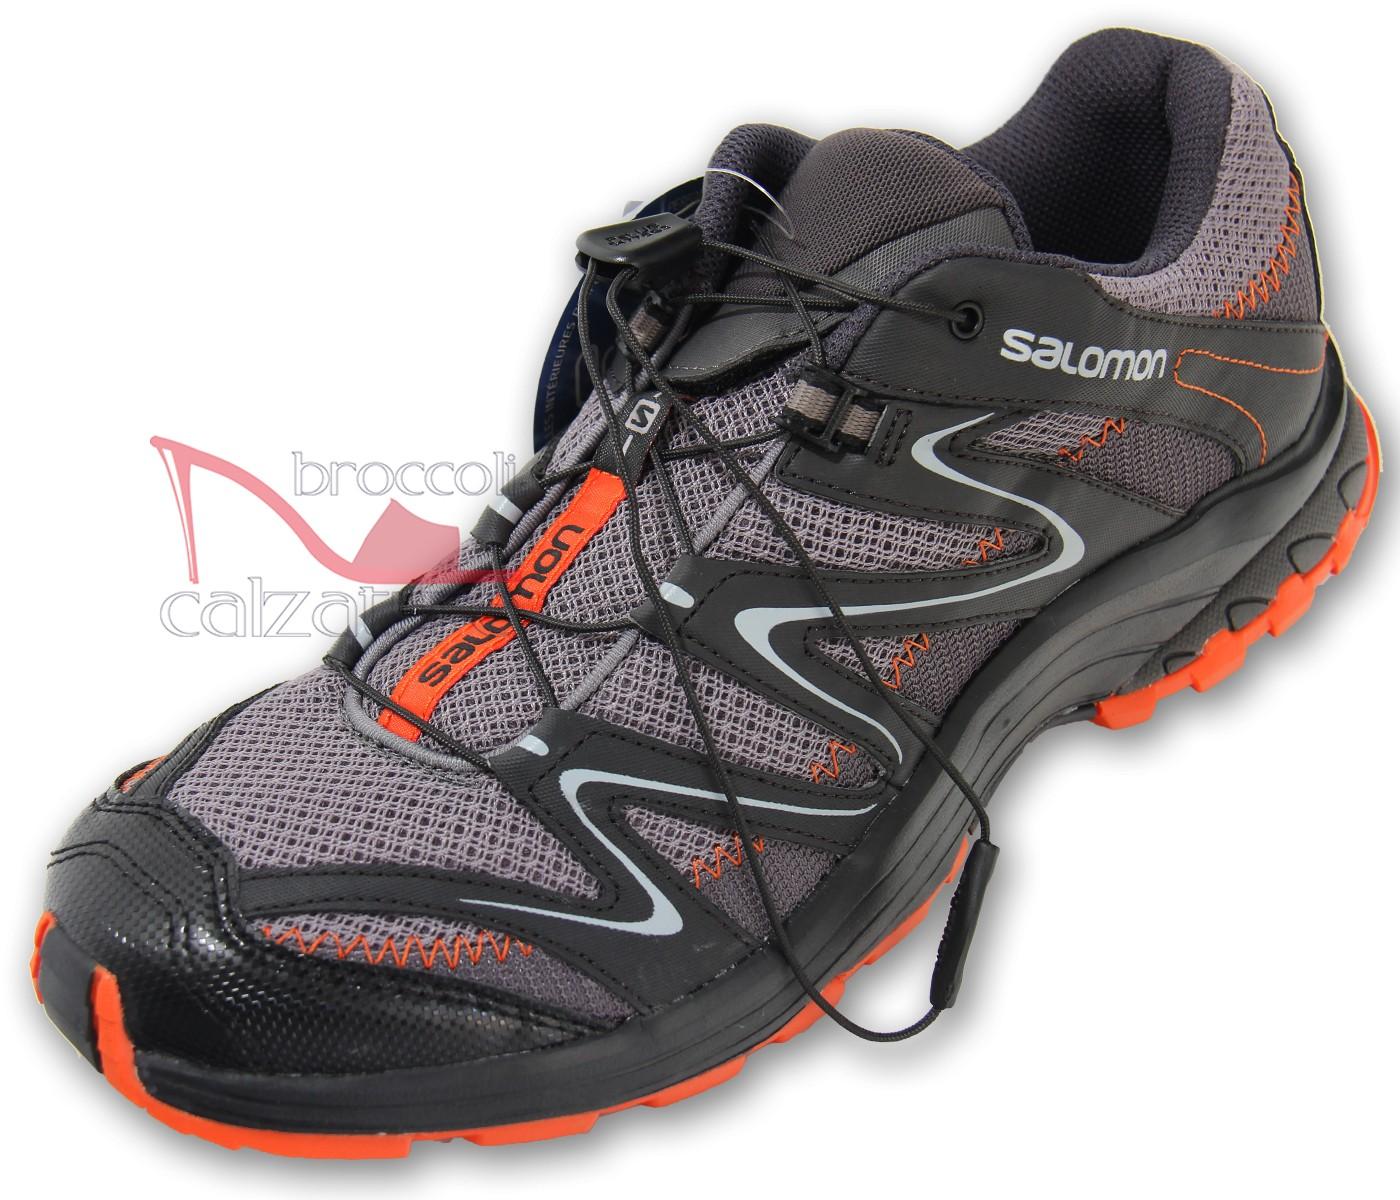 7156724221fae Montagna Trekking Uomo Salomon Scarpe Scarpa qHvt1xa